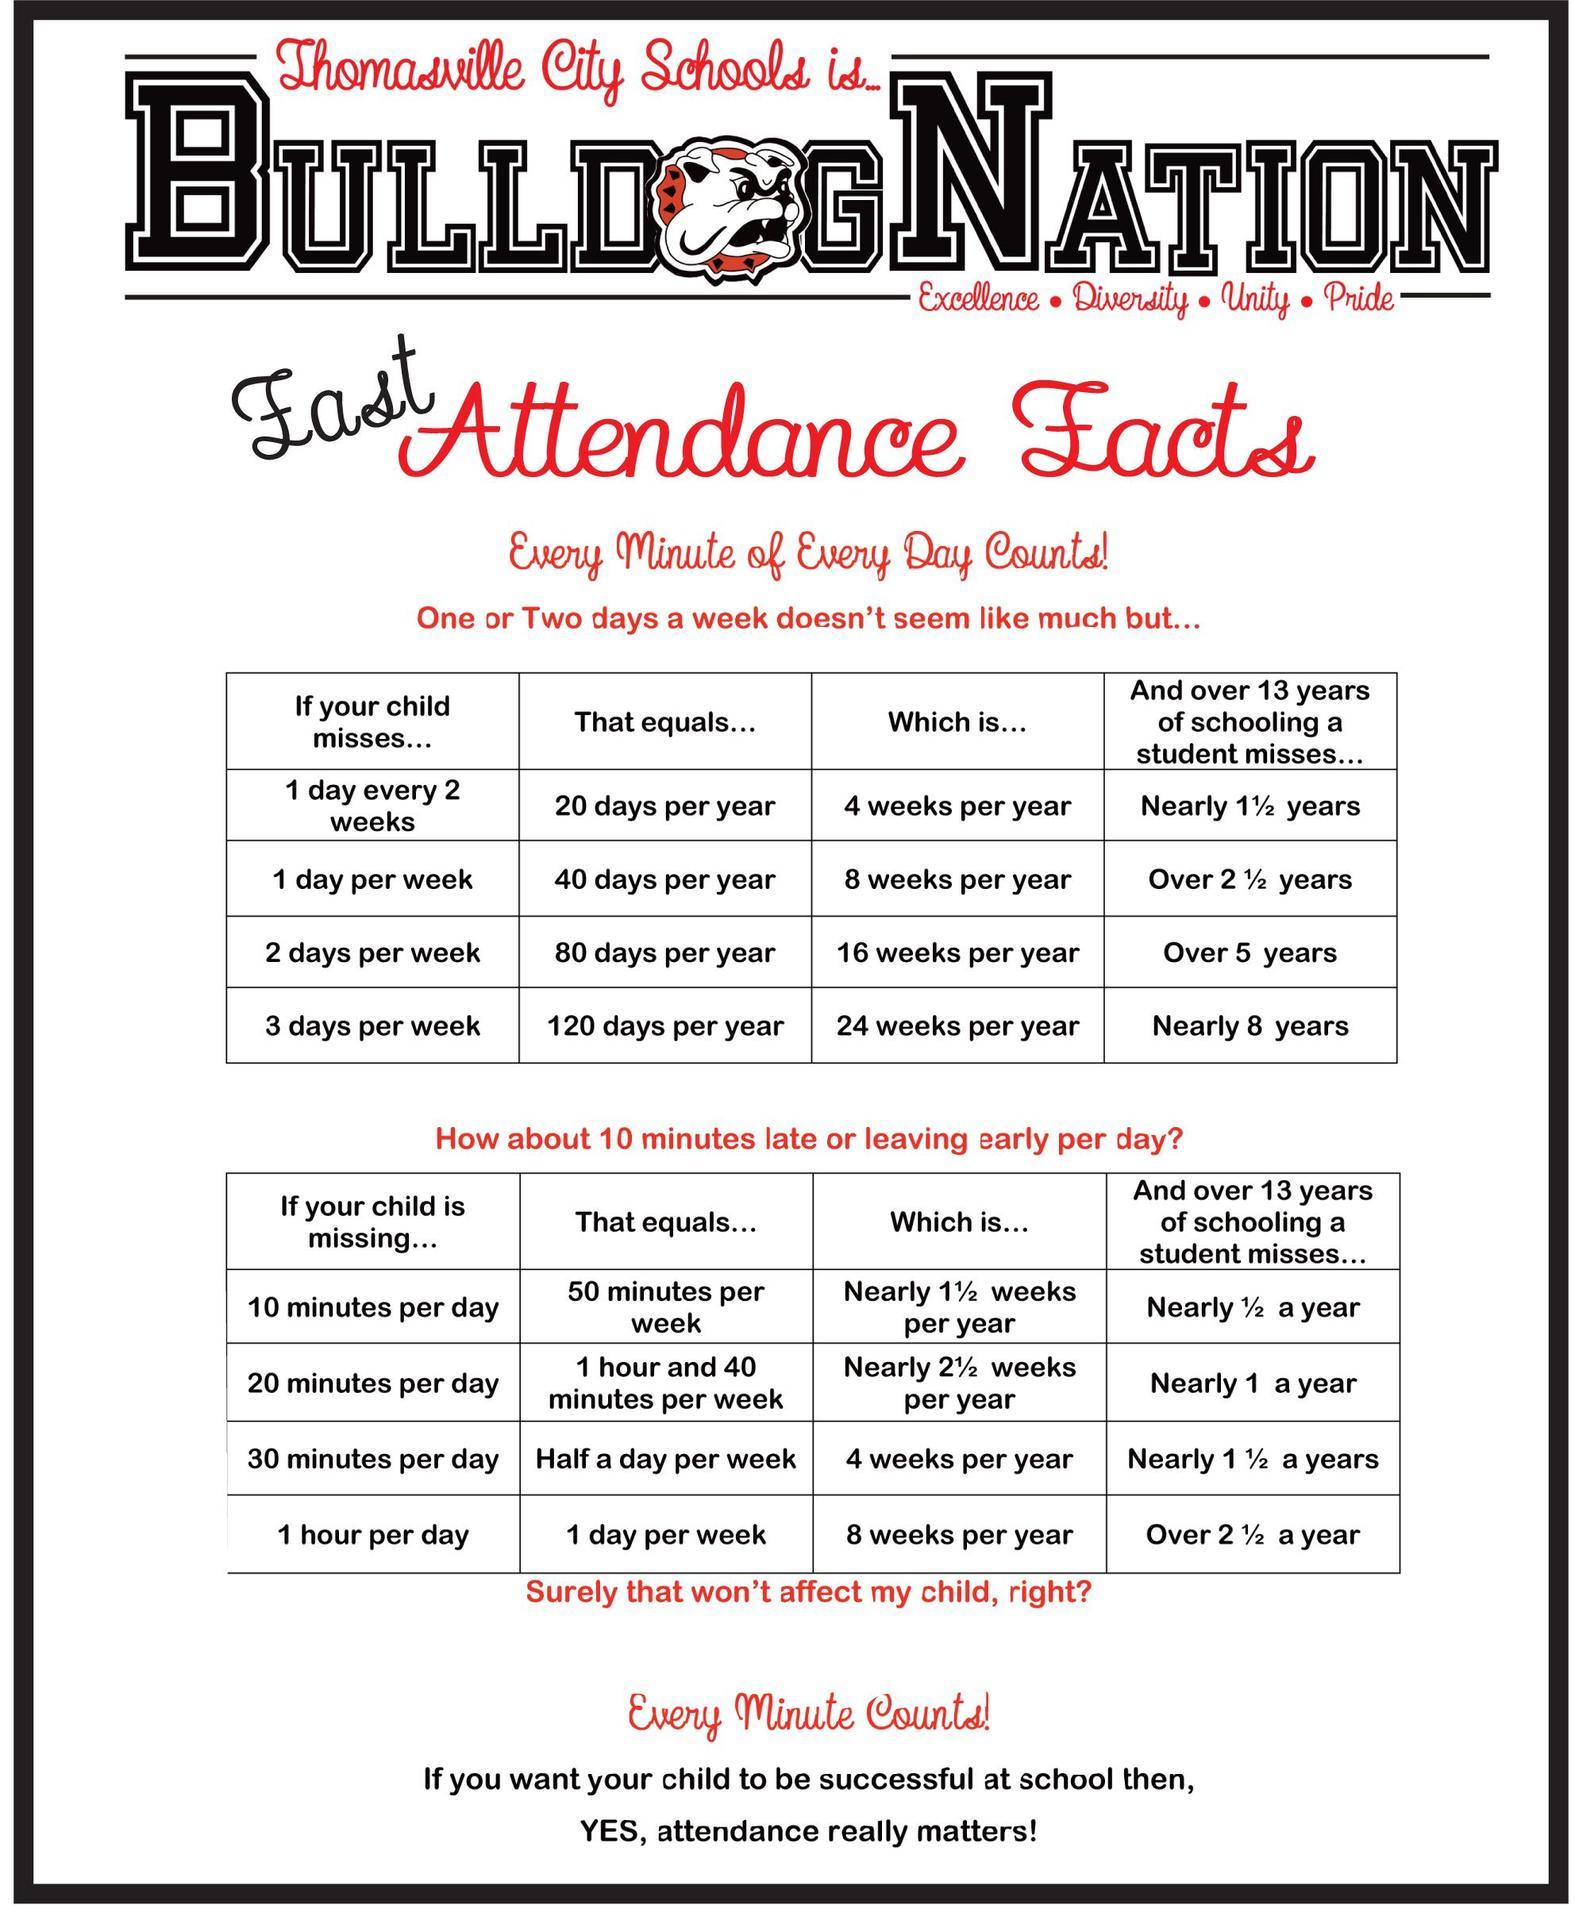 Attendance Time Matters Chart